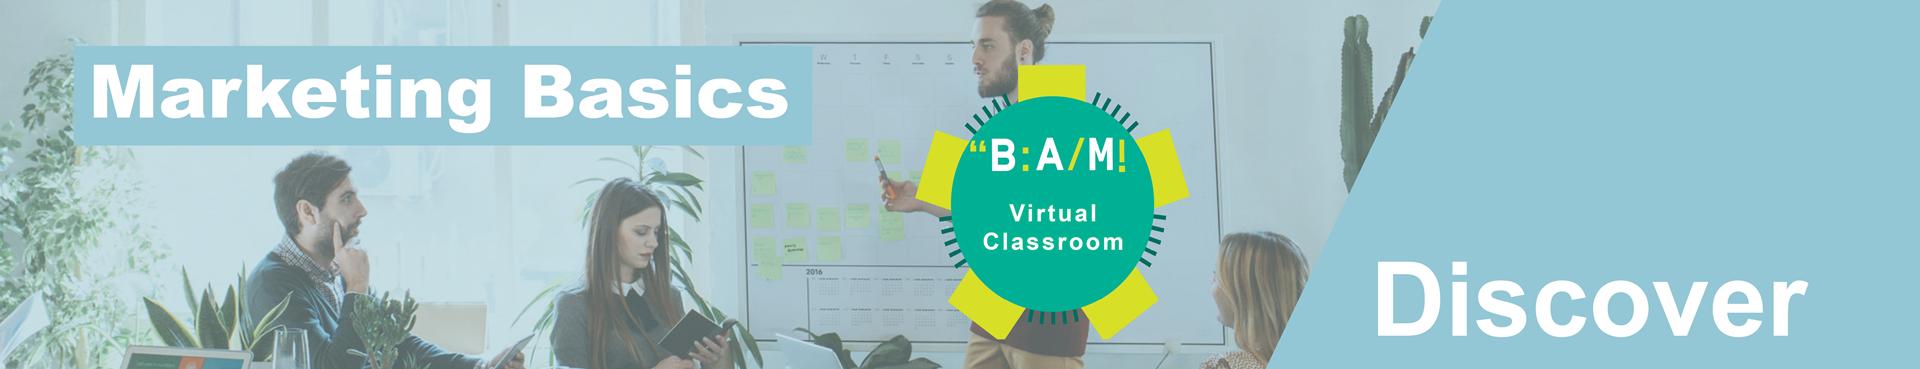 Discover_marketing basics_virtual classroom